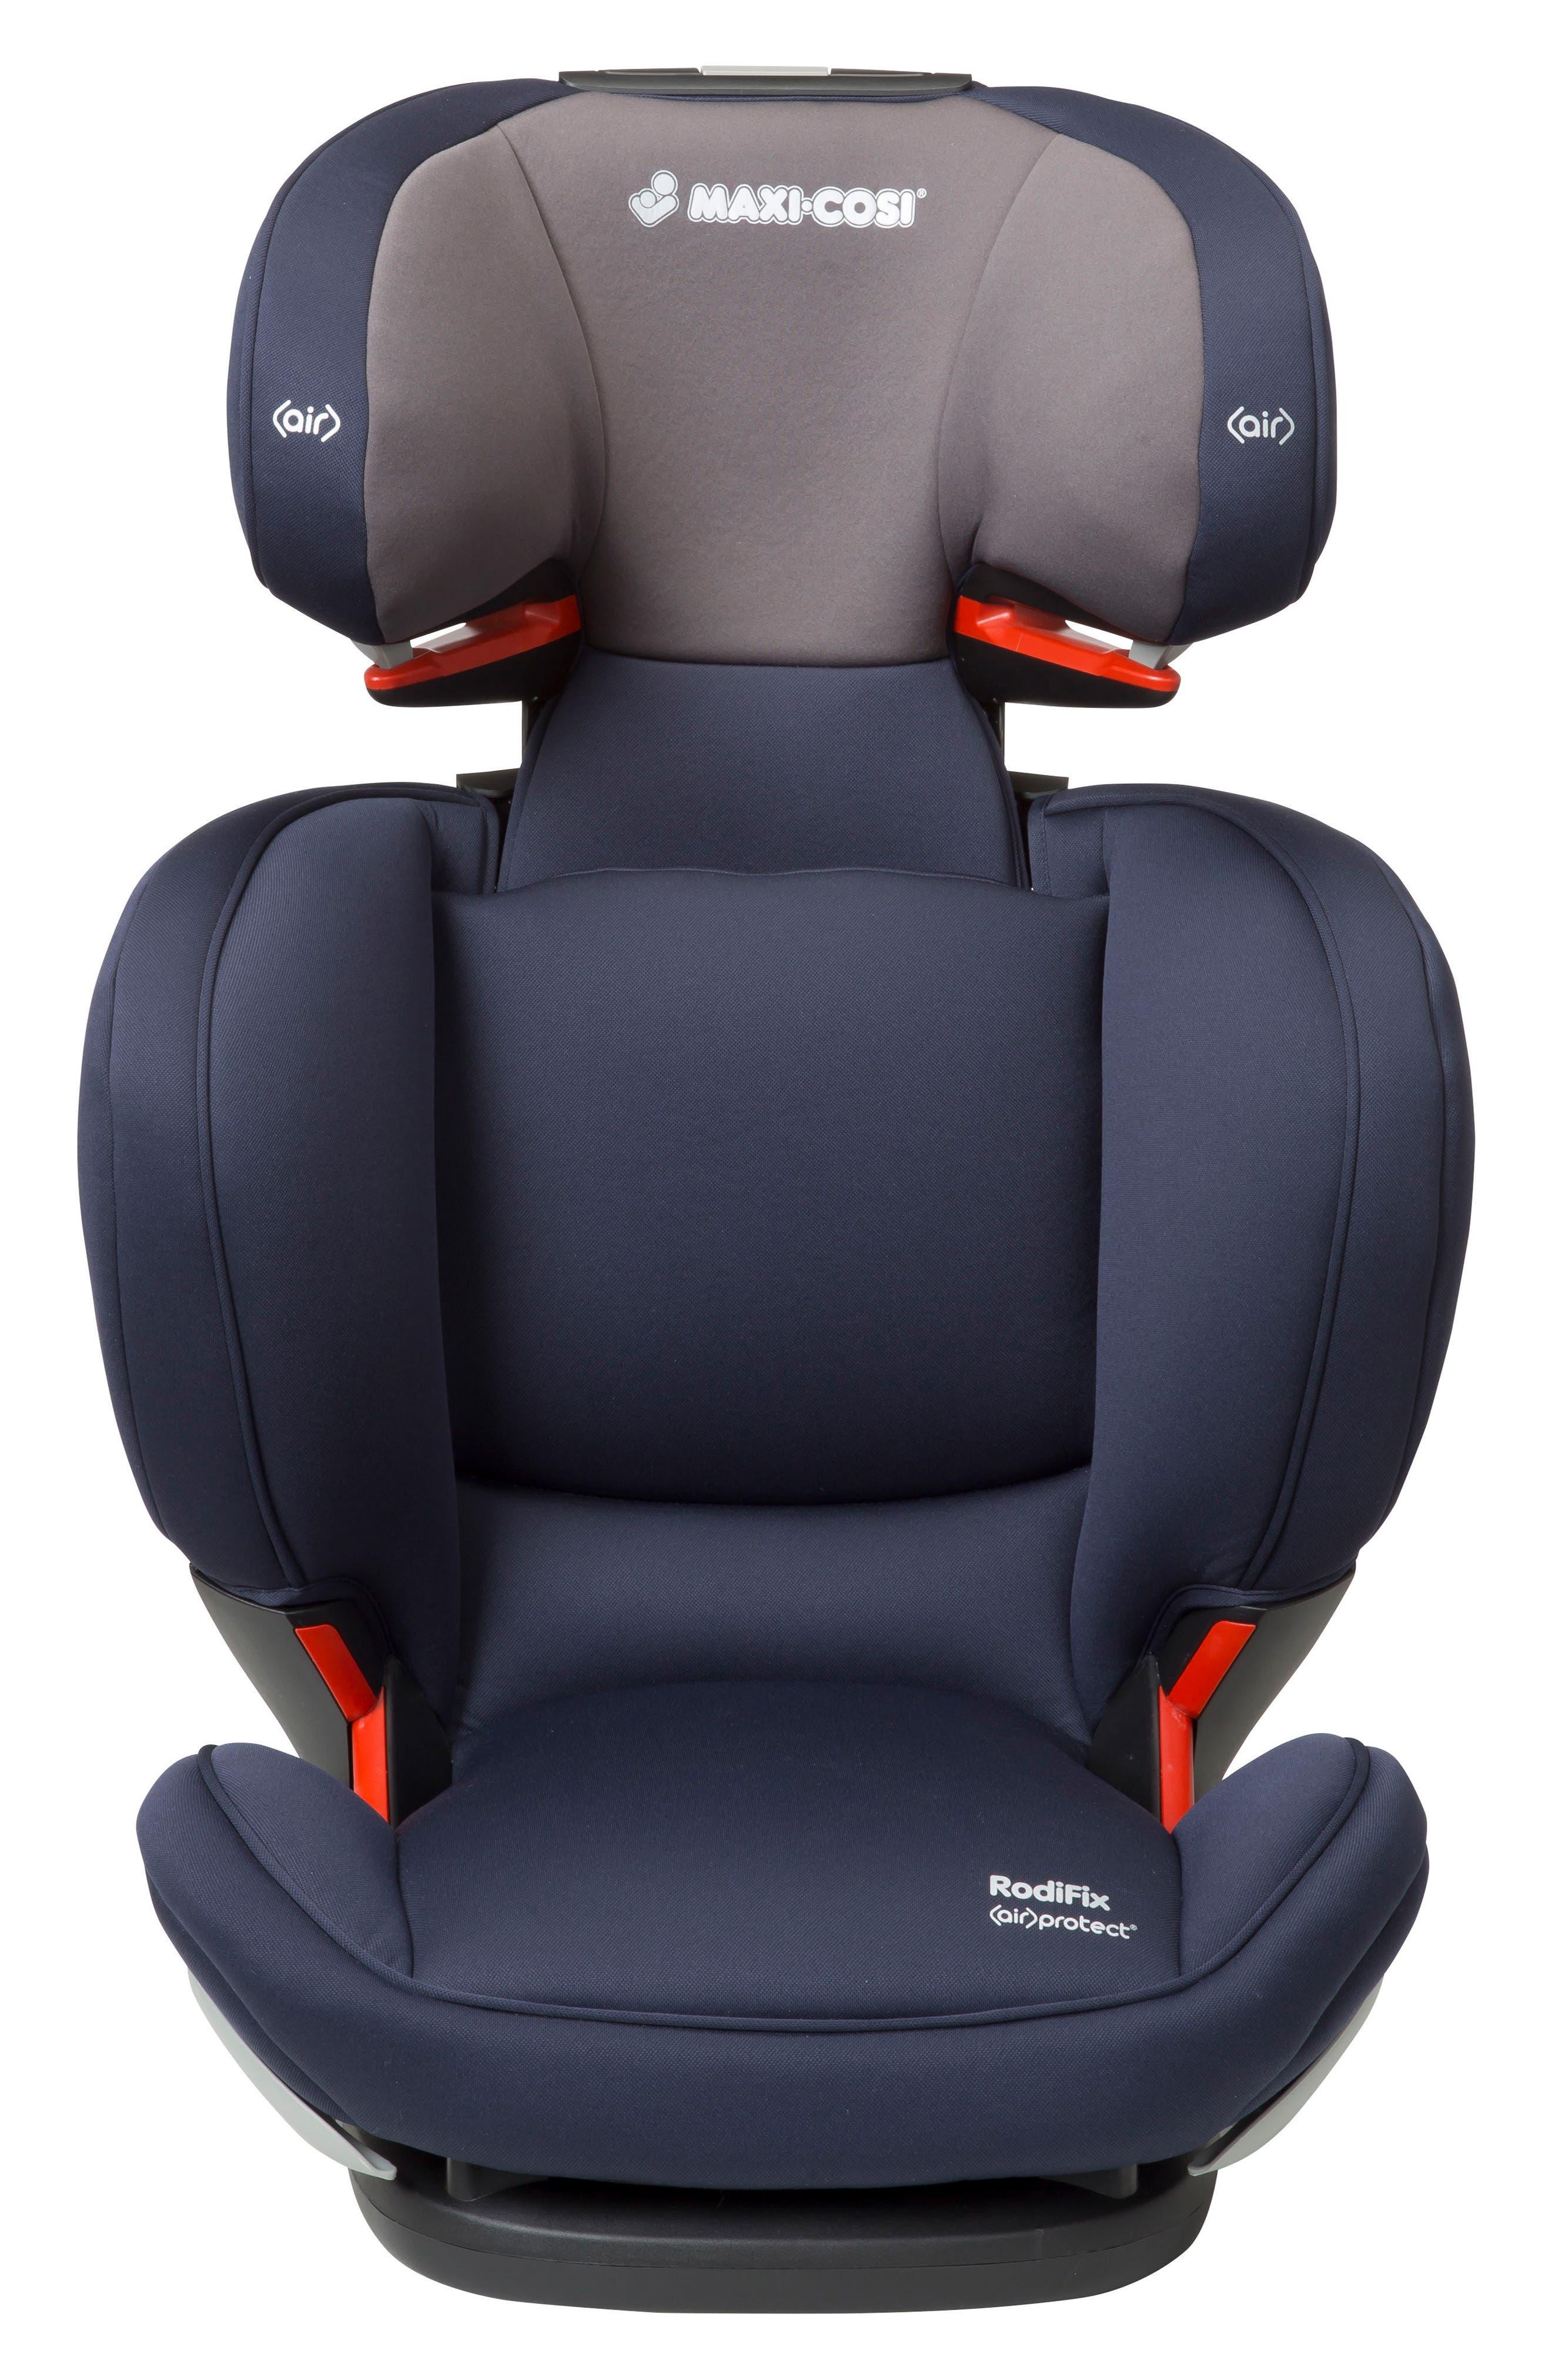 RodiFix Booster Car Seat,                             Main thumbnail 1, color,                             Navy